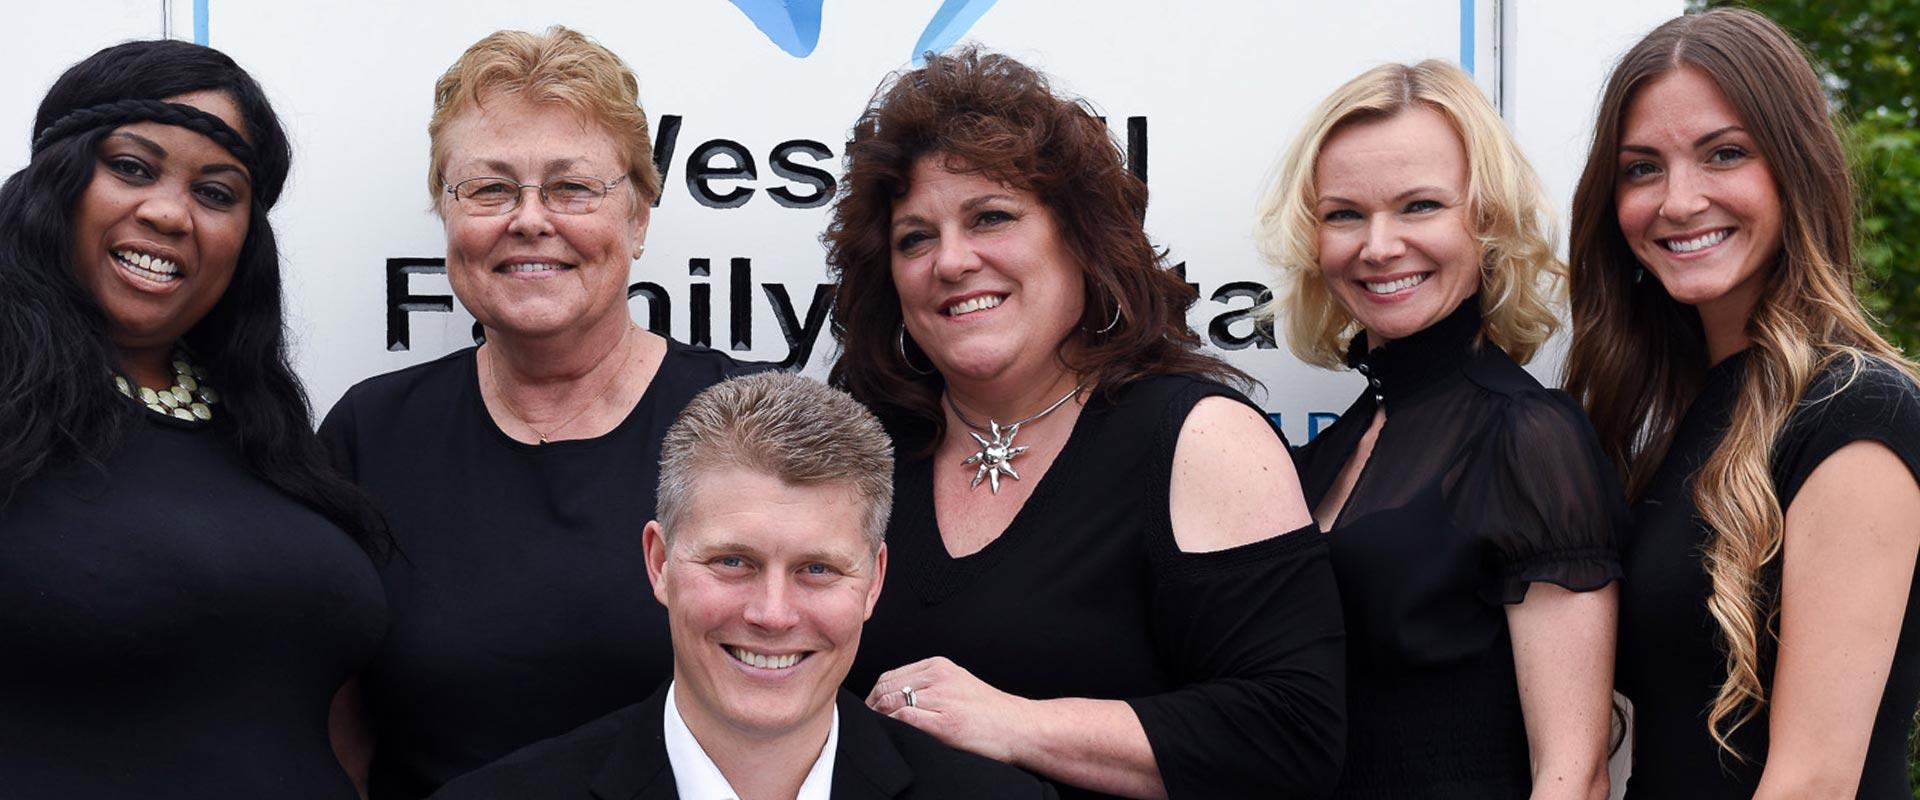 West Hill Family Dental team